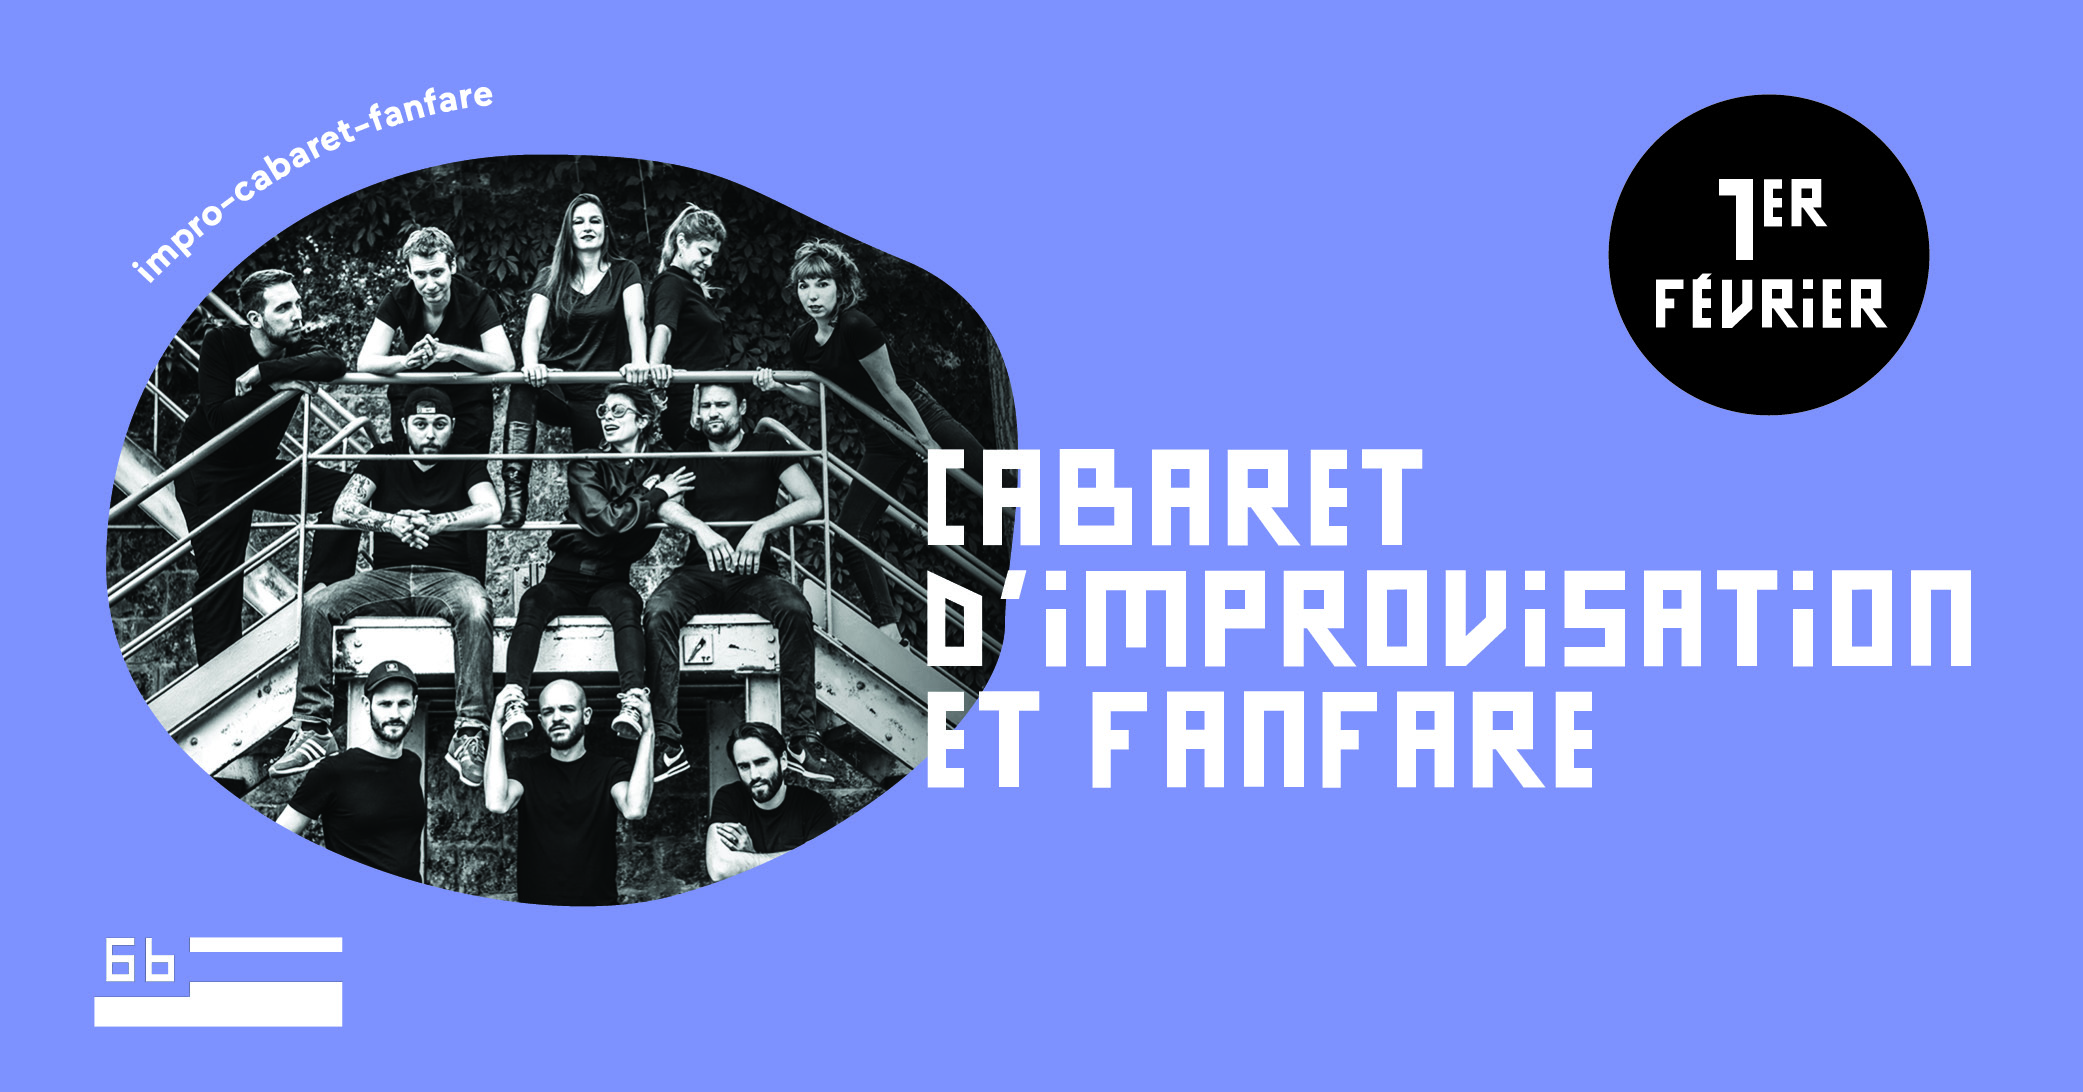 Cabaret d'improvisation et fanfare